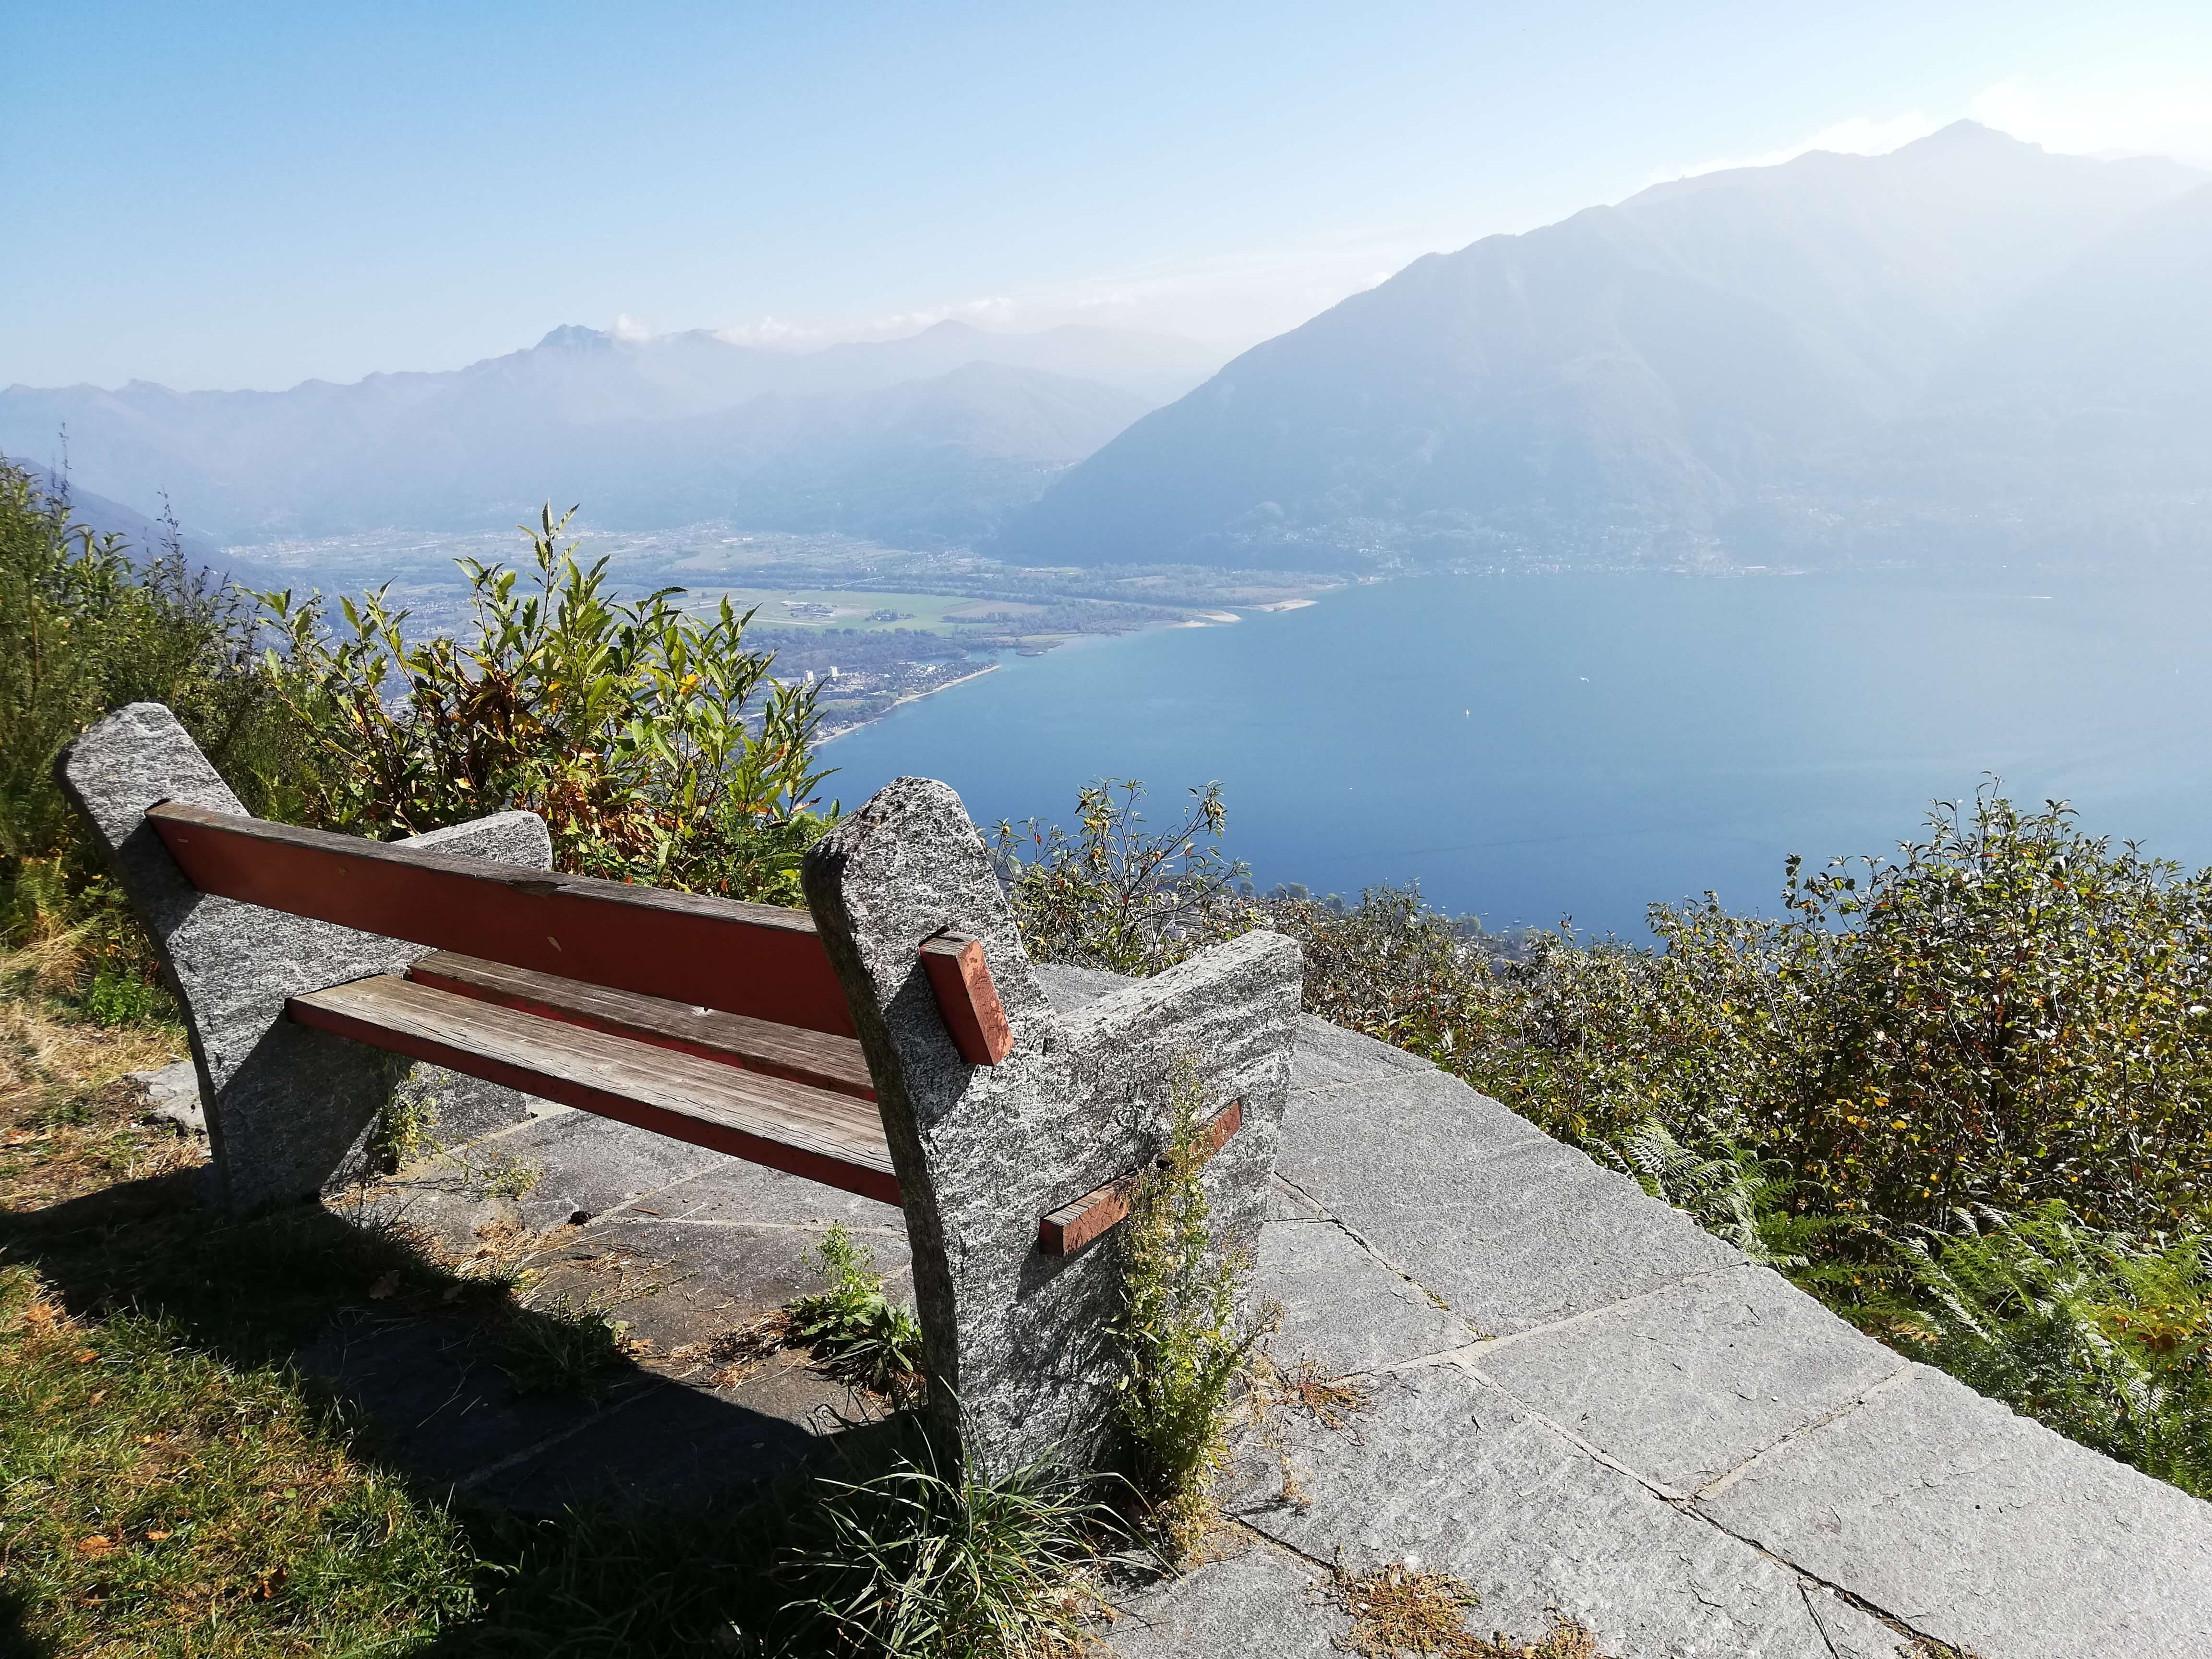 Ausflugsziele rund um Ascona /Schweiz Lago Maggiore